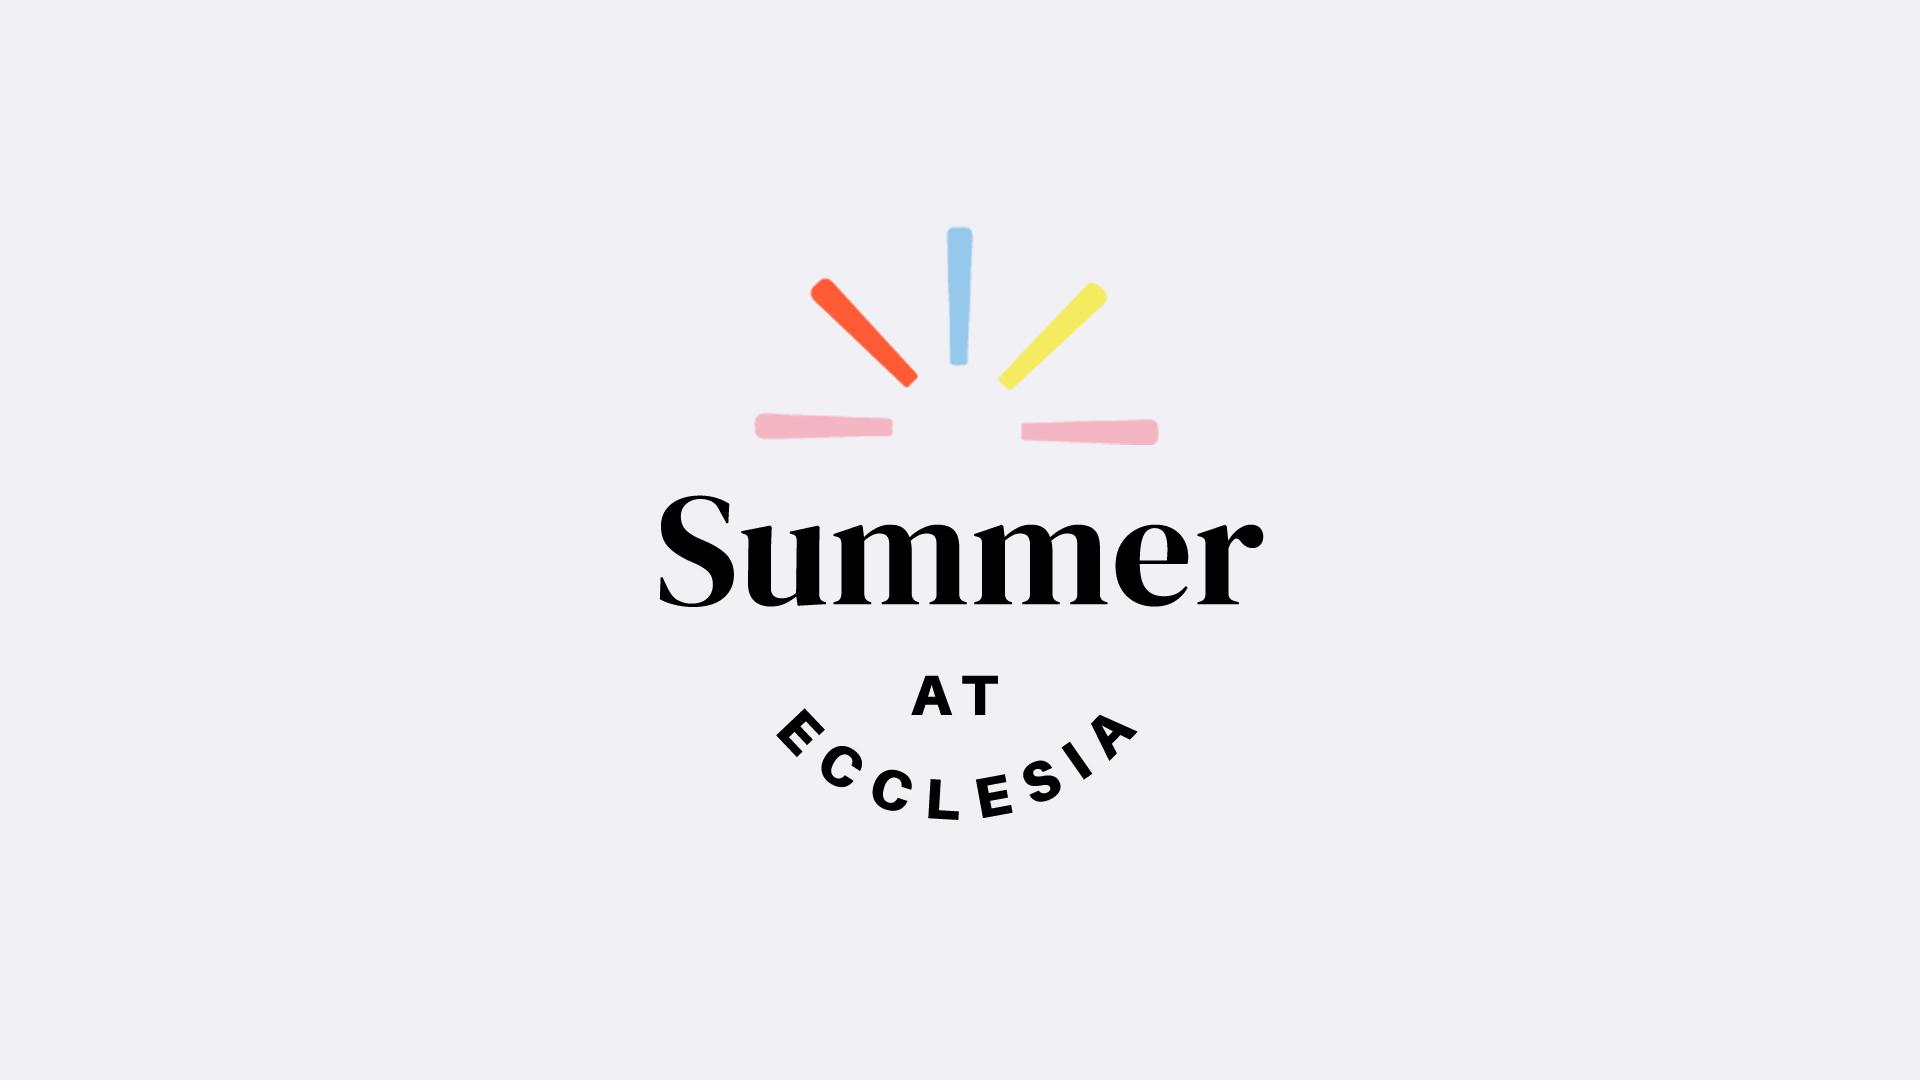 Summer at Ecclesia